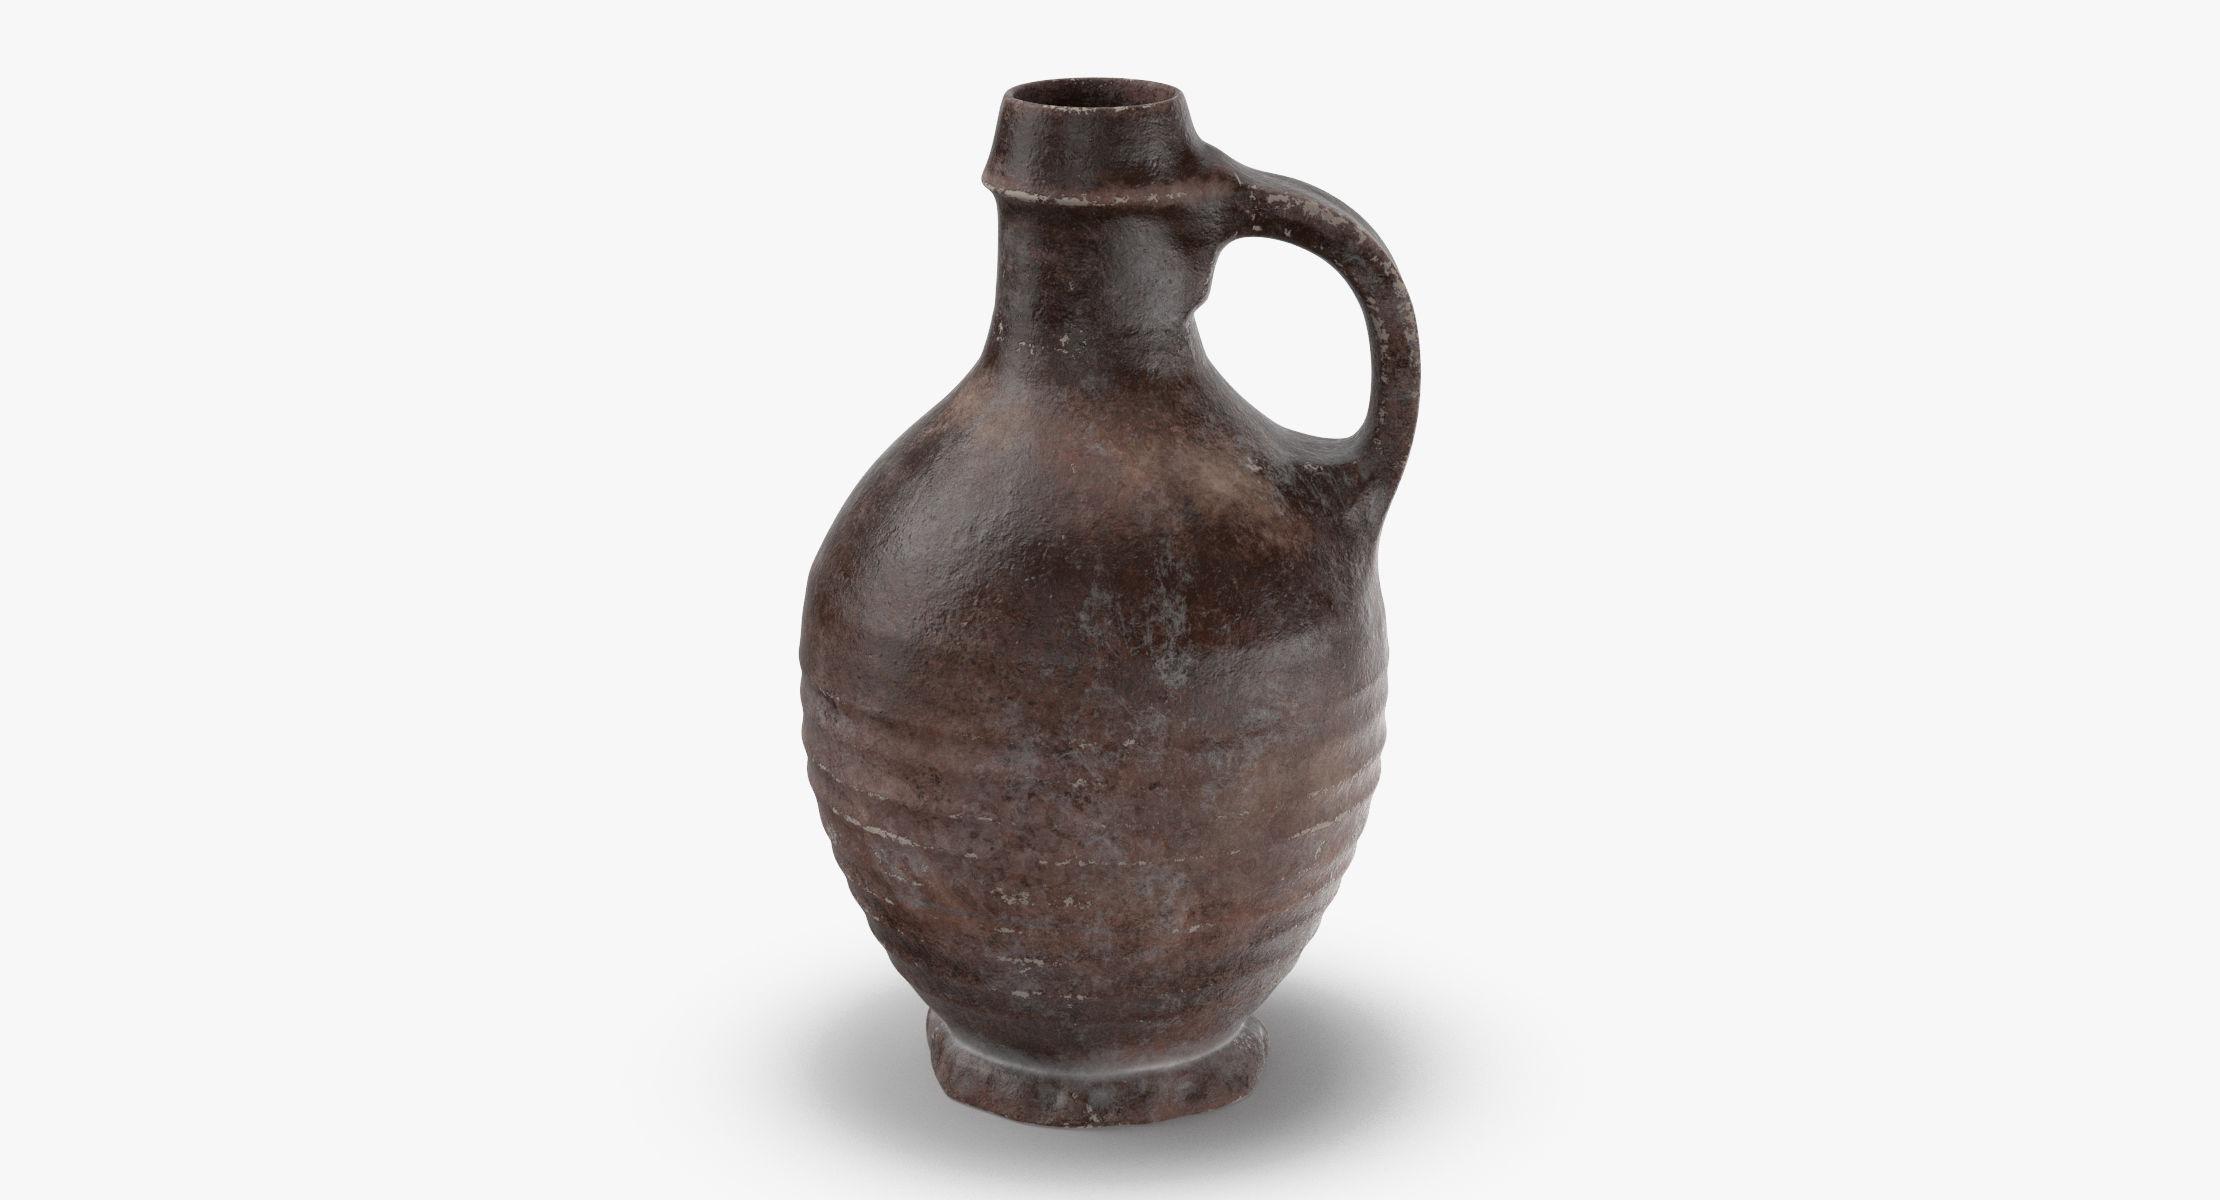 Ceramic Wine Jug 04 - reel 1